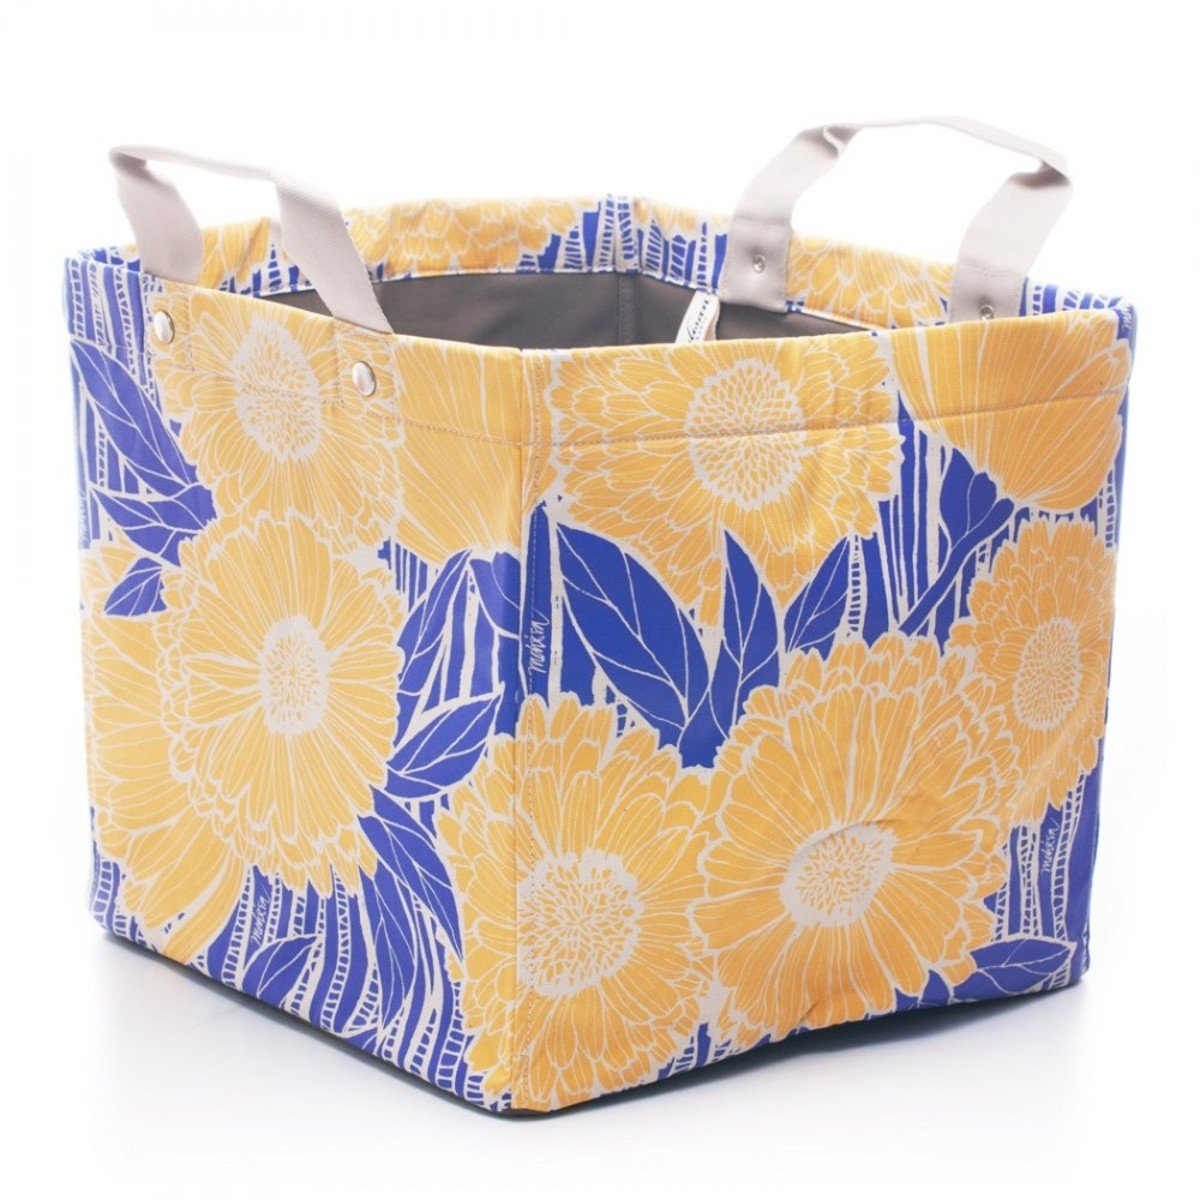 多用途儲物袋 - Yellow Sunflower